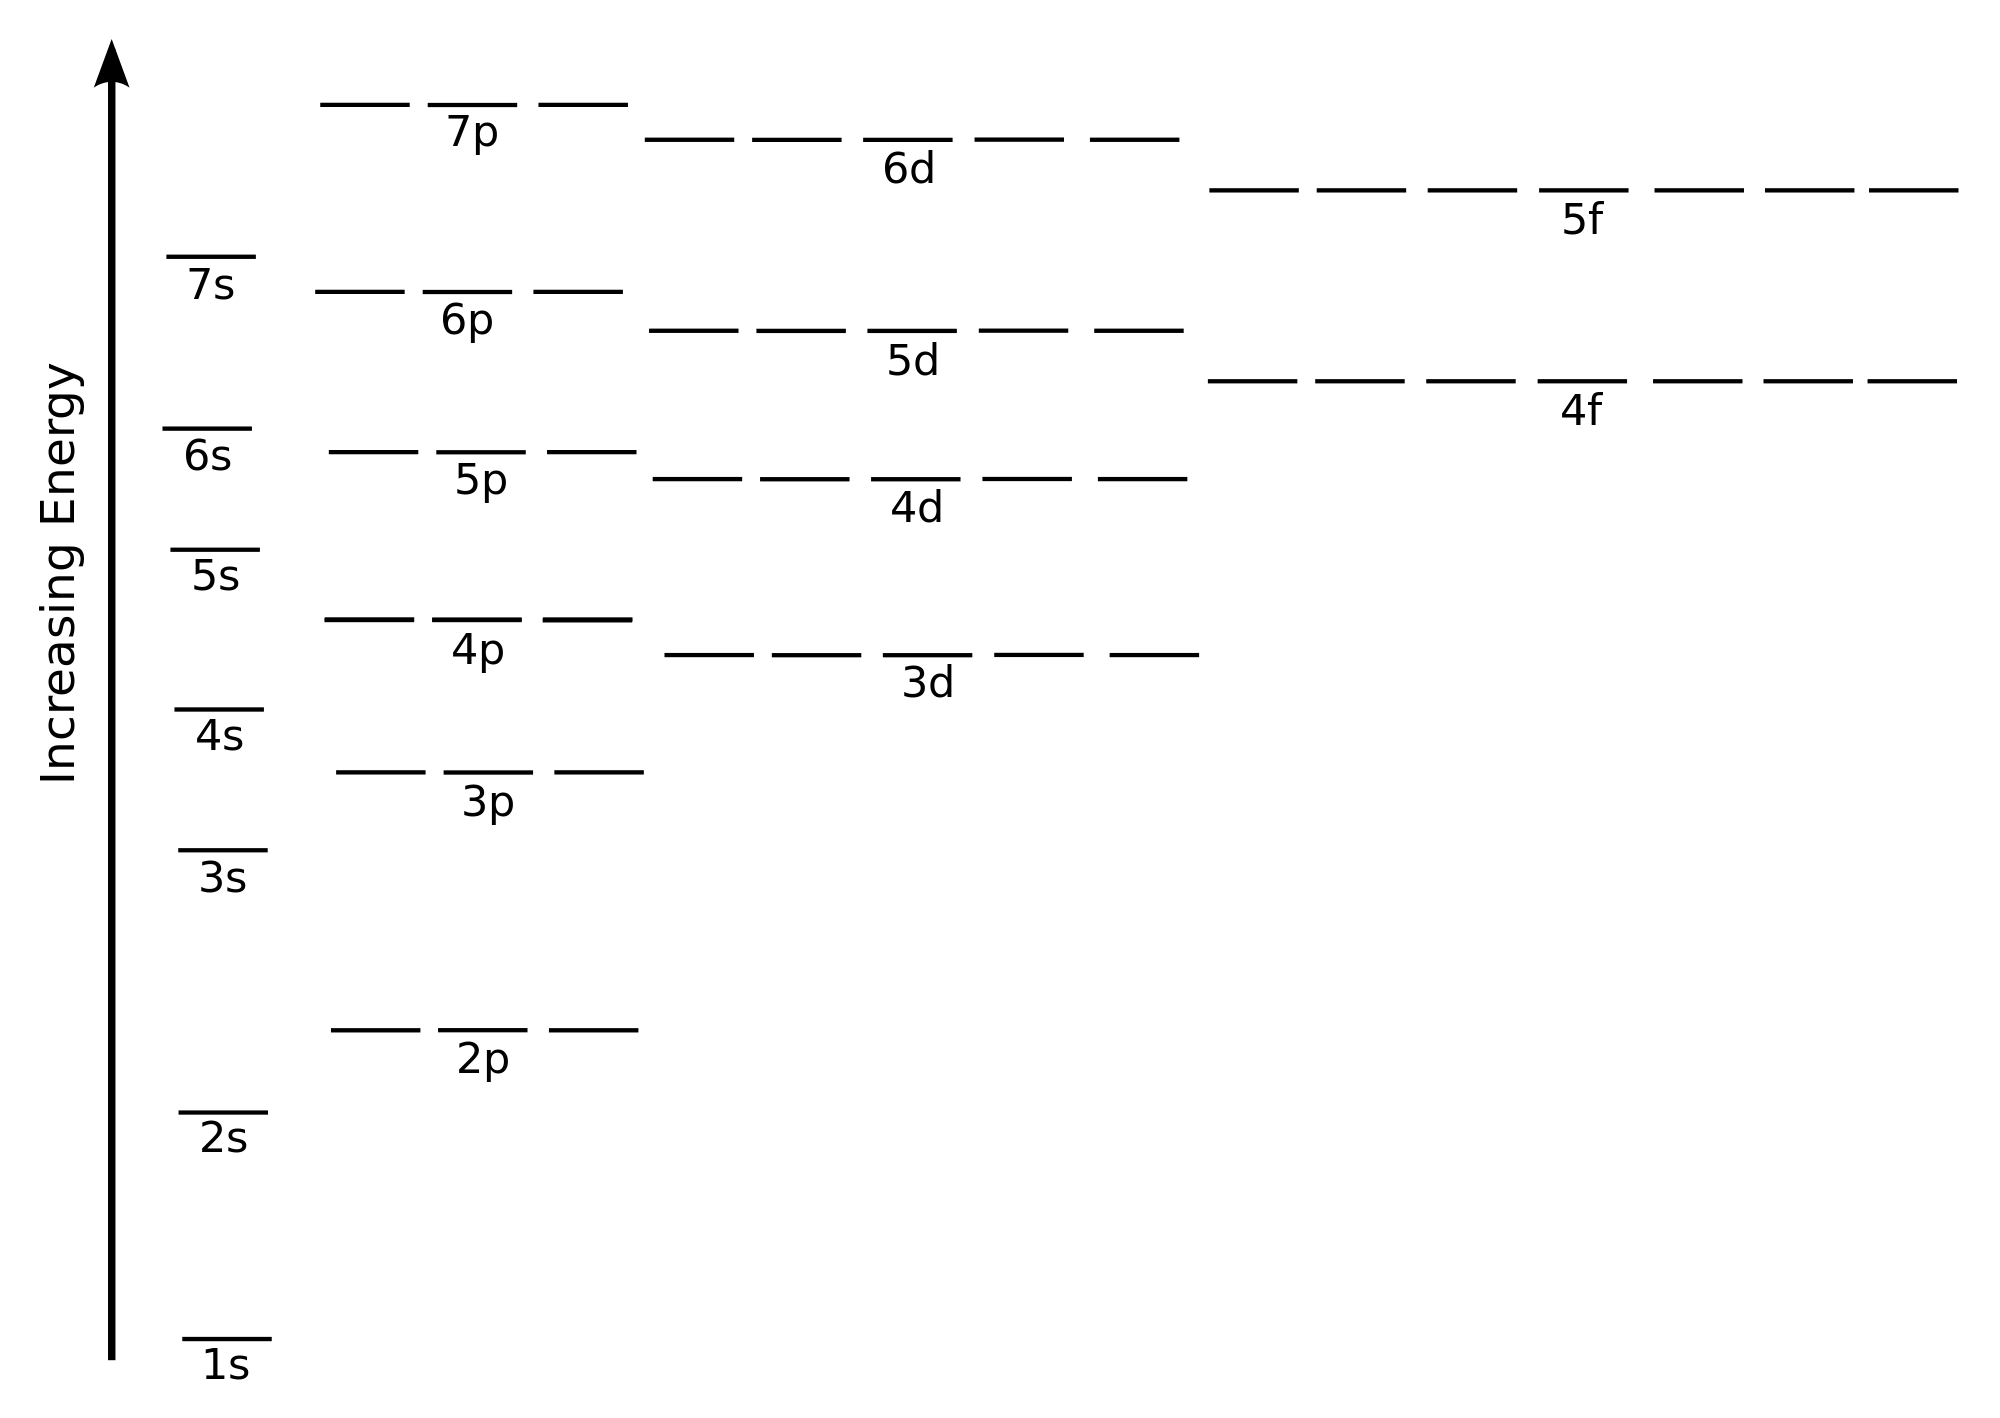 Molecular Orbital Energy Level Diagram